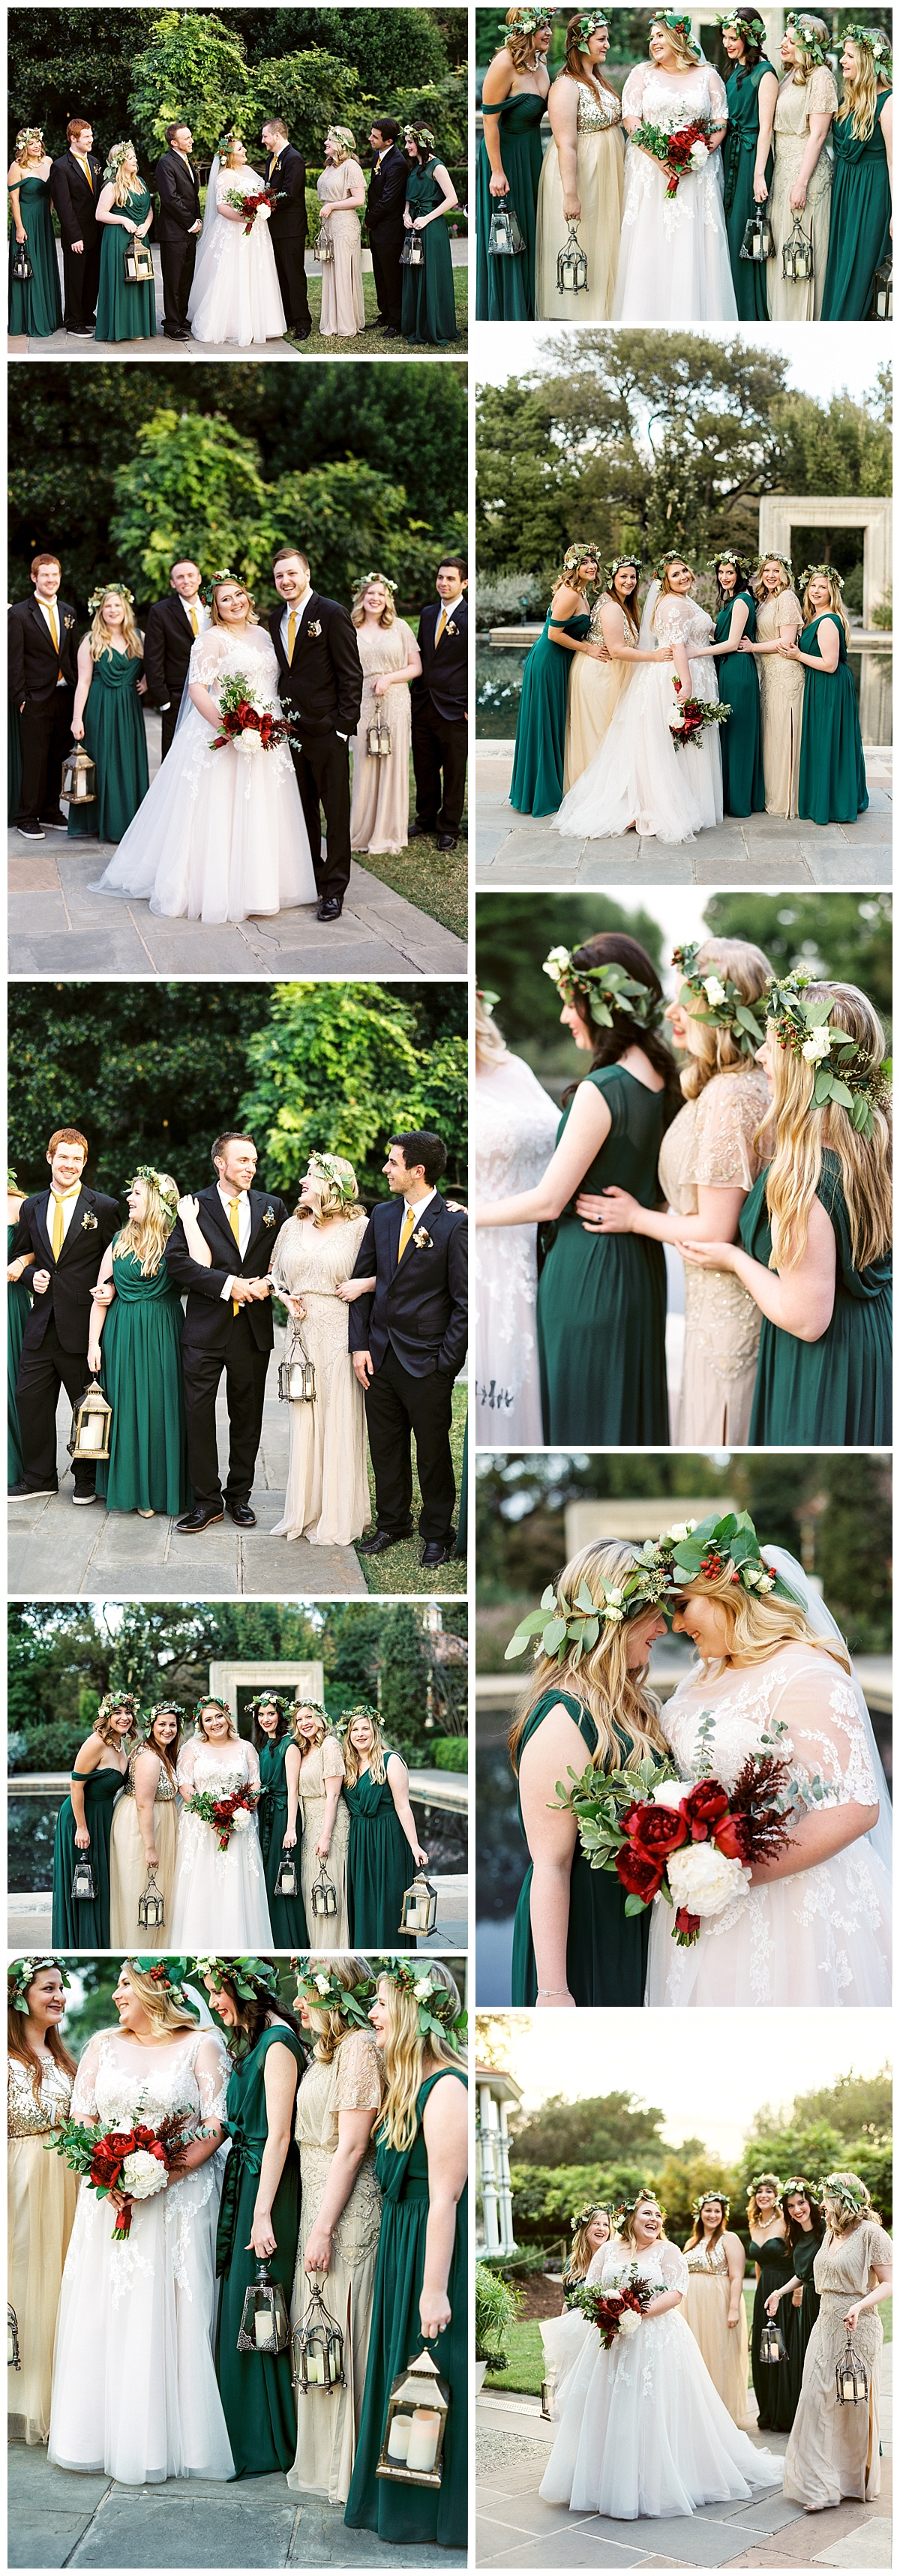 dallas-arboretum-and-botanical-garden-wedding-ar-photography-4.jpg